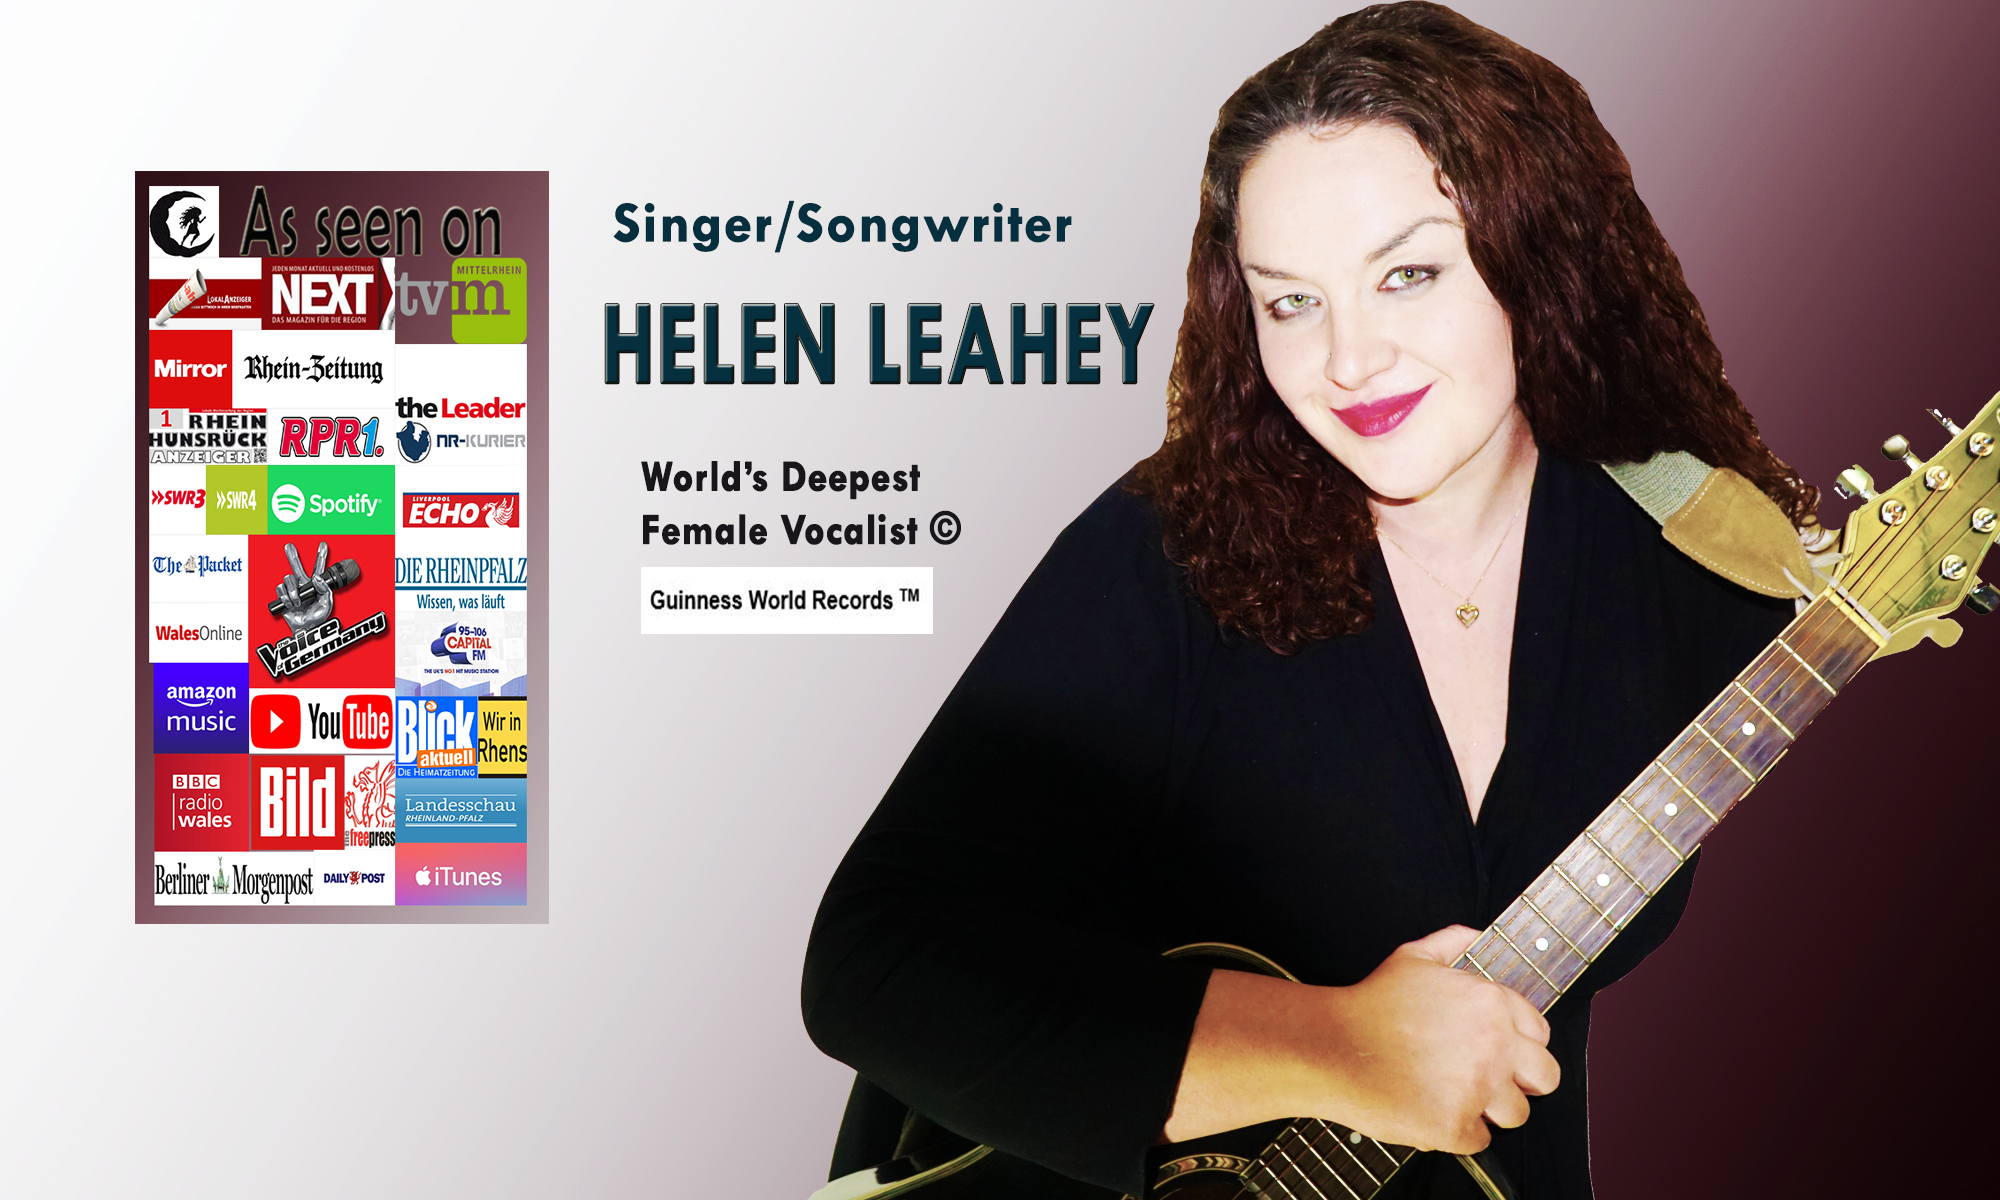 Helen Leahey